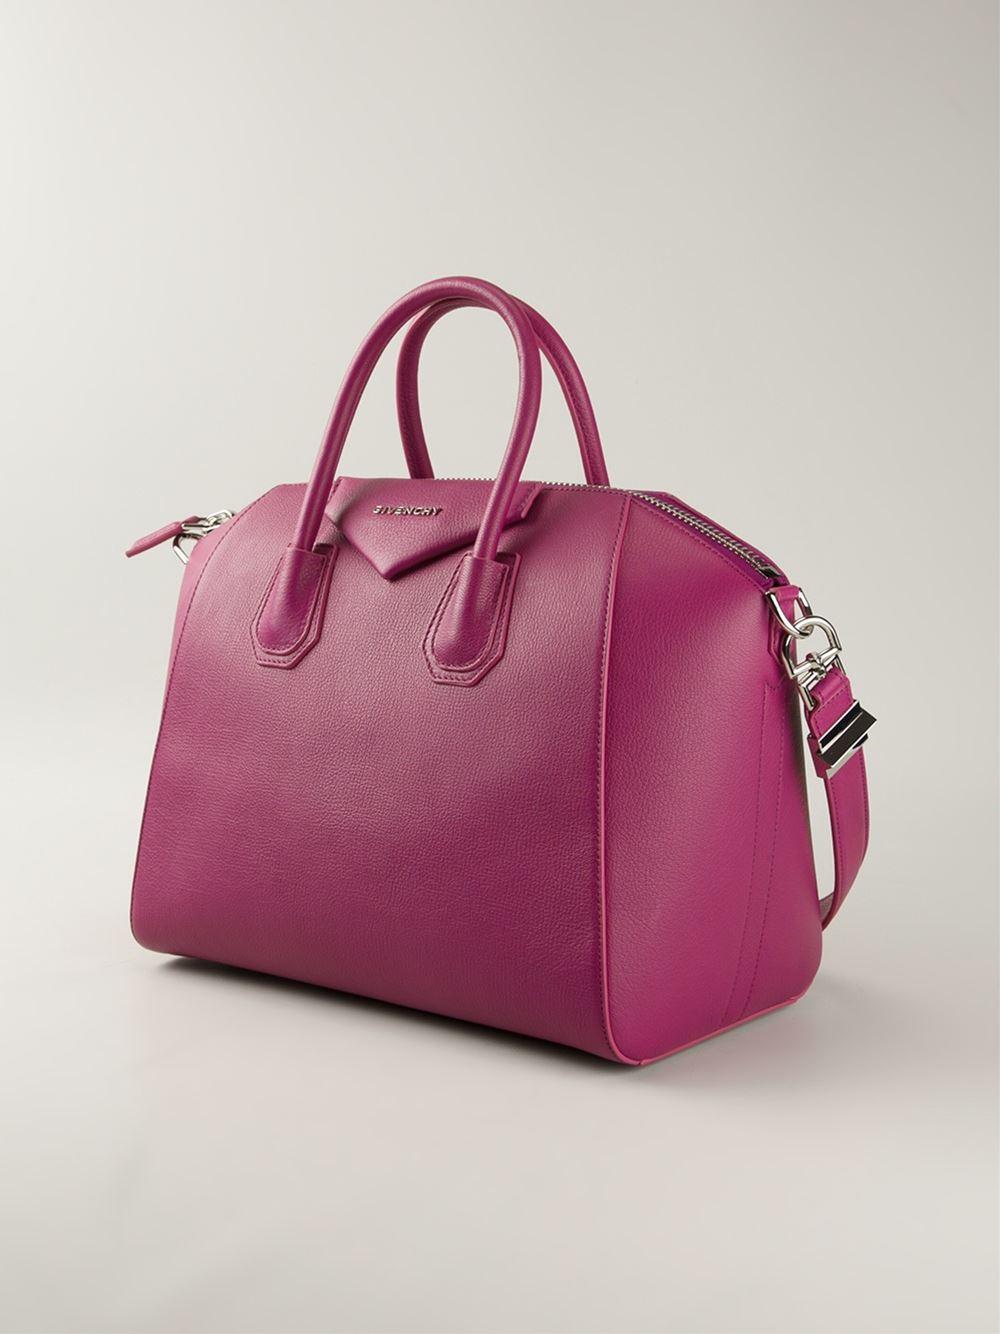 Lyst - Givenchy Medium  Antigona  Tote in Purple 543122c192f14